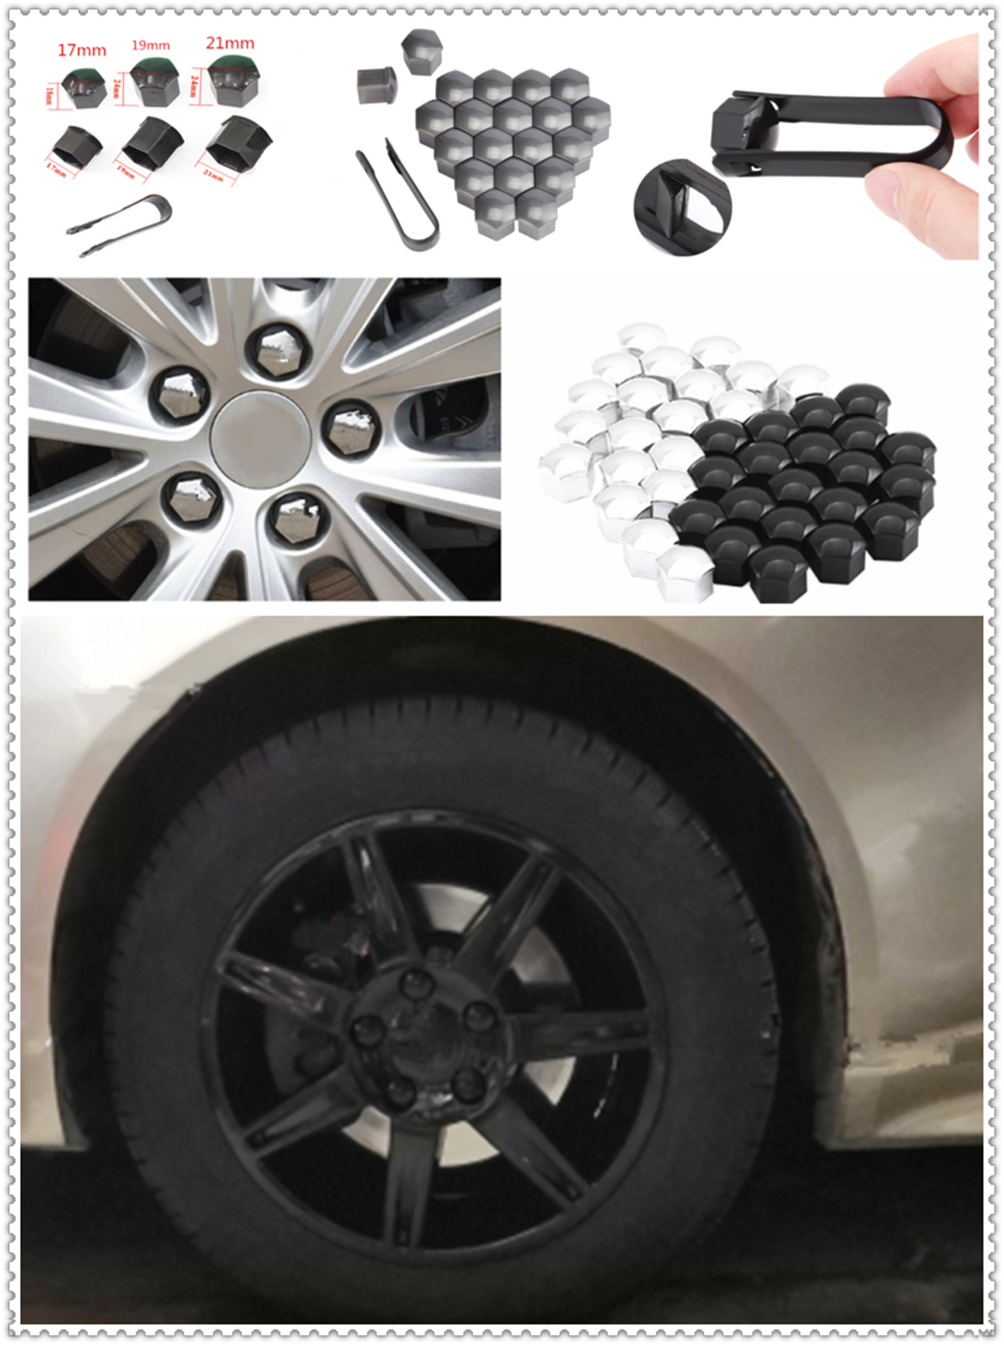 auto-shape-20pcs-car-wheel-cover-screw-protector-nut-dustproof-17-19mm-for-mclaren-font-b-senna-b-font-720s-600lt-570s-675lt-570gt